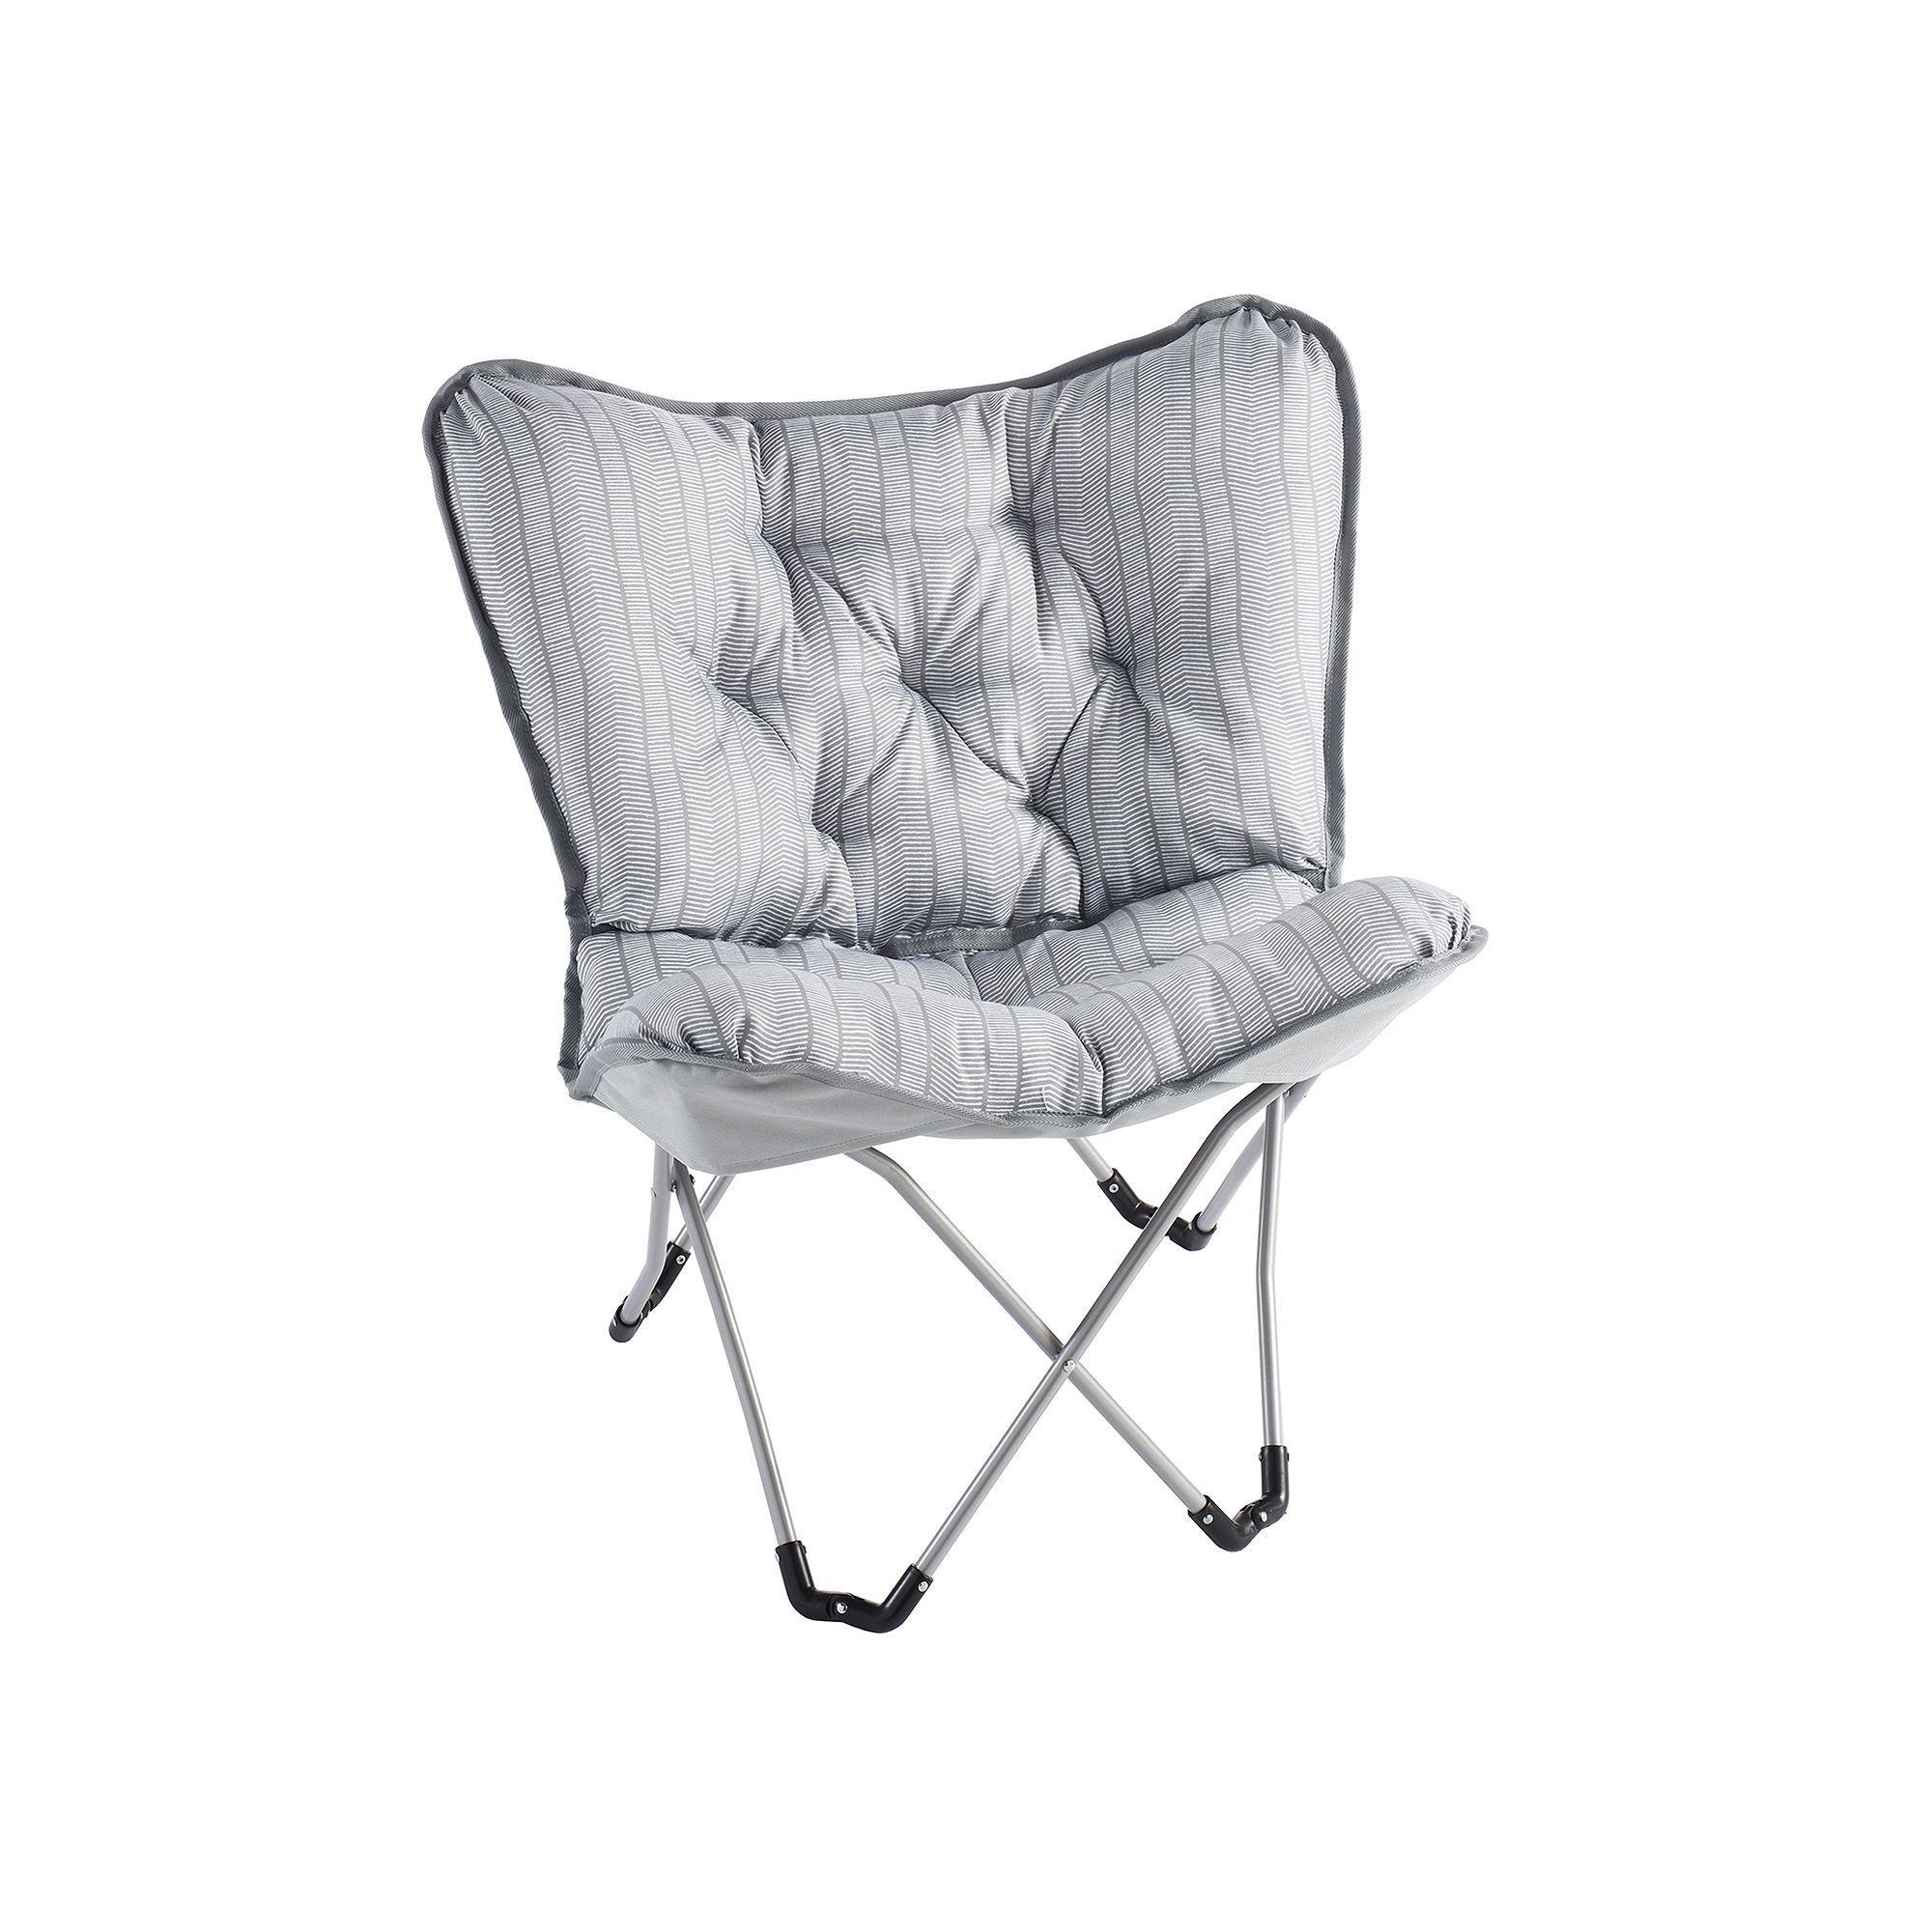 Simple By Design Memory Foam Butterfly Chair Black